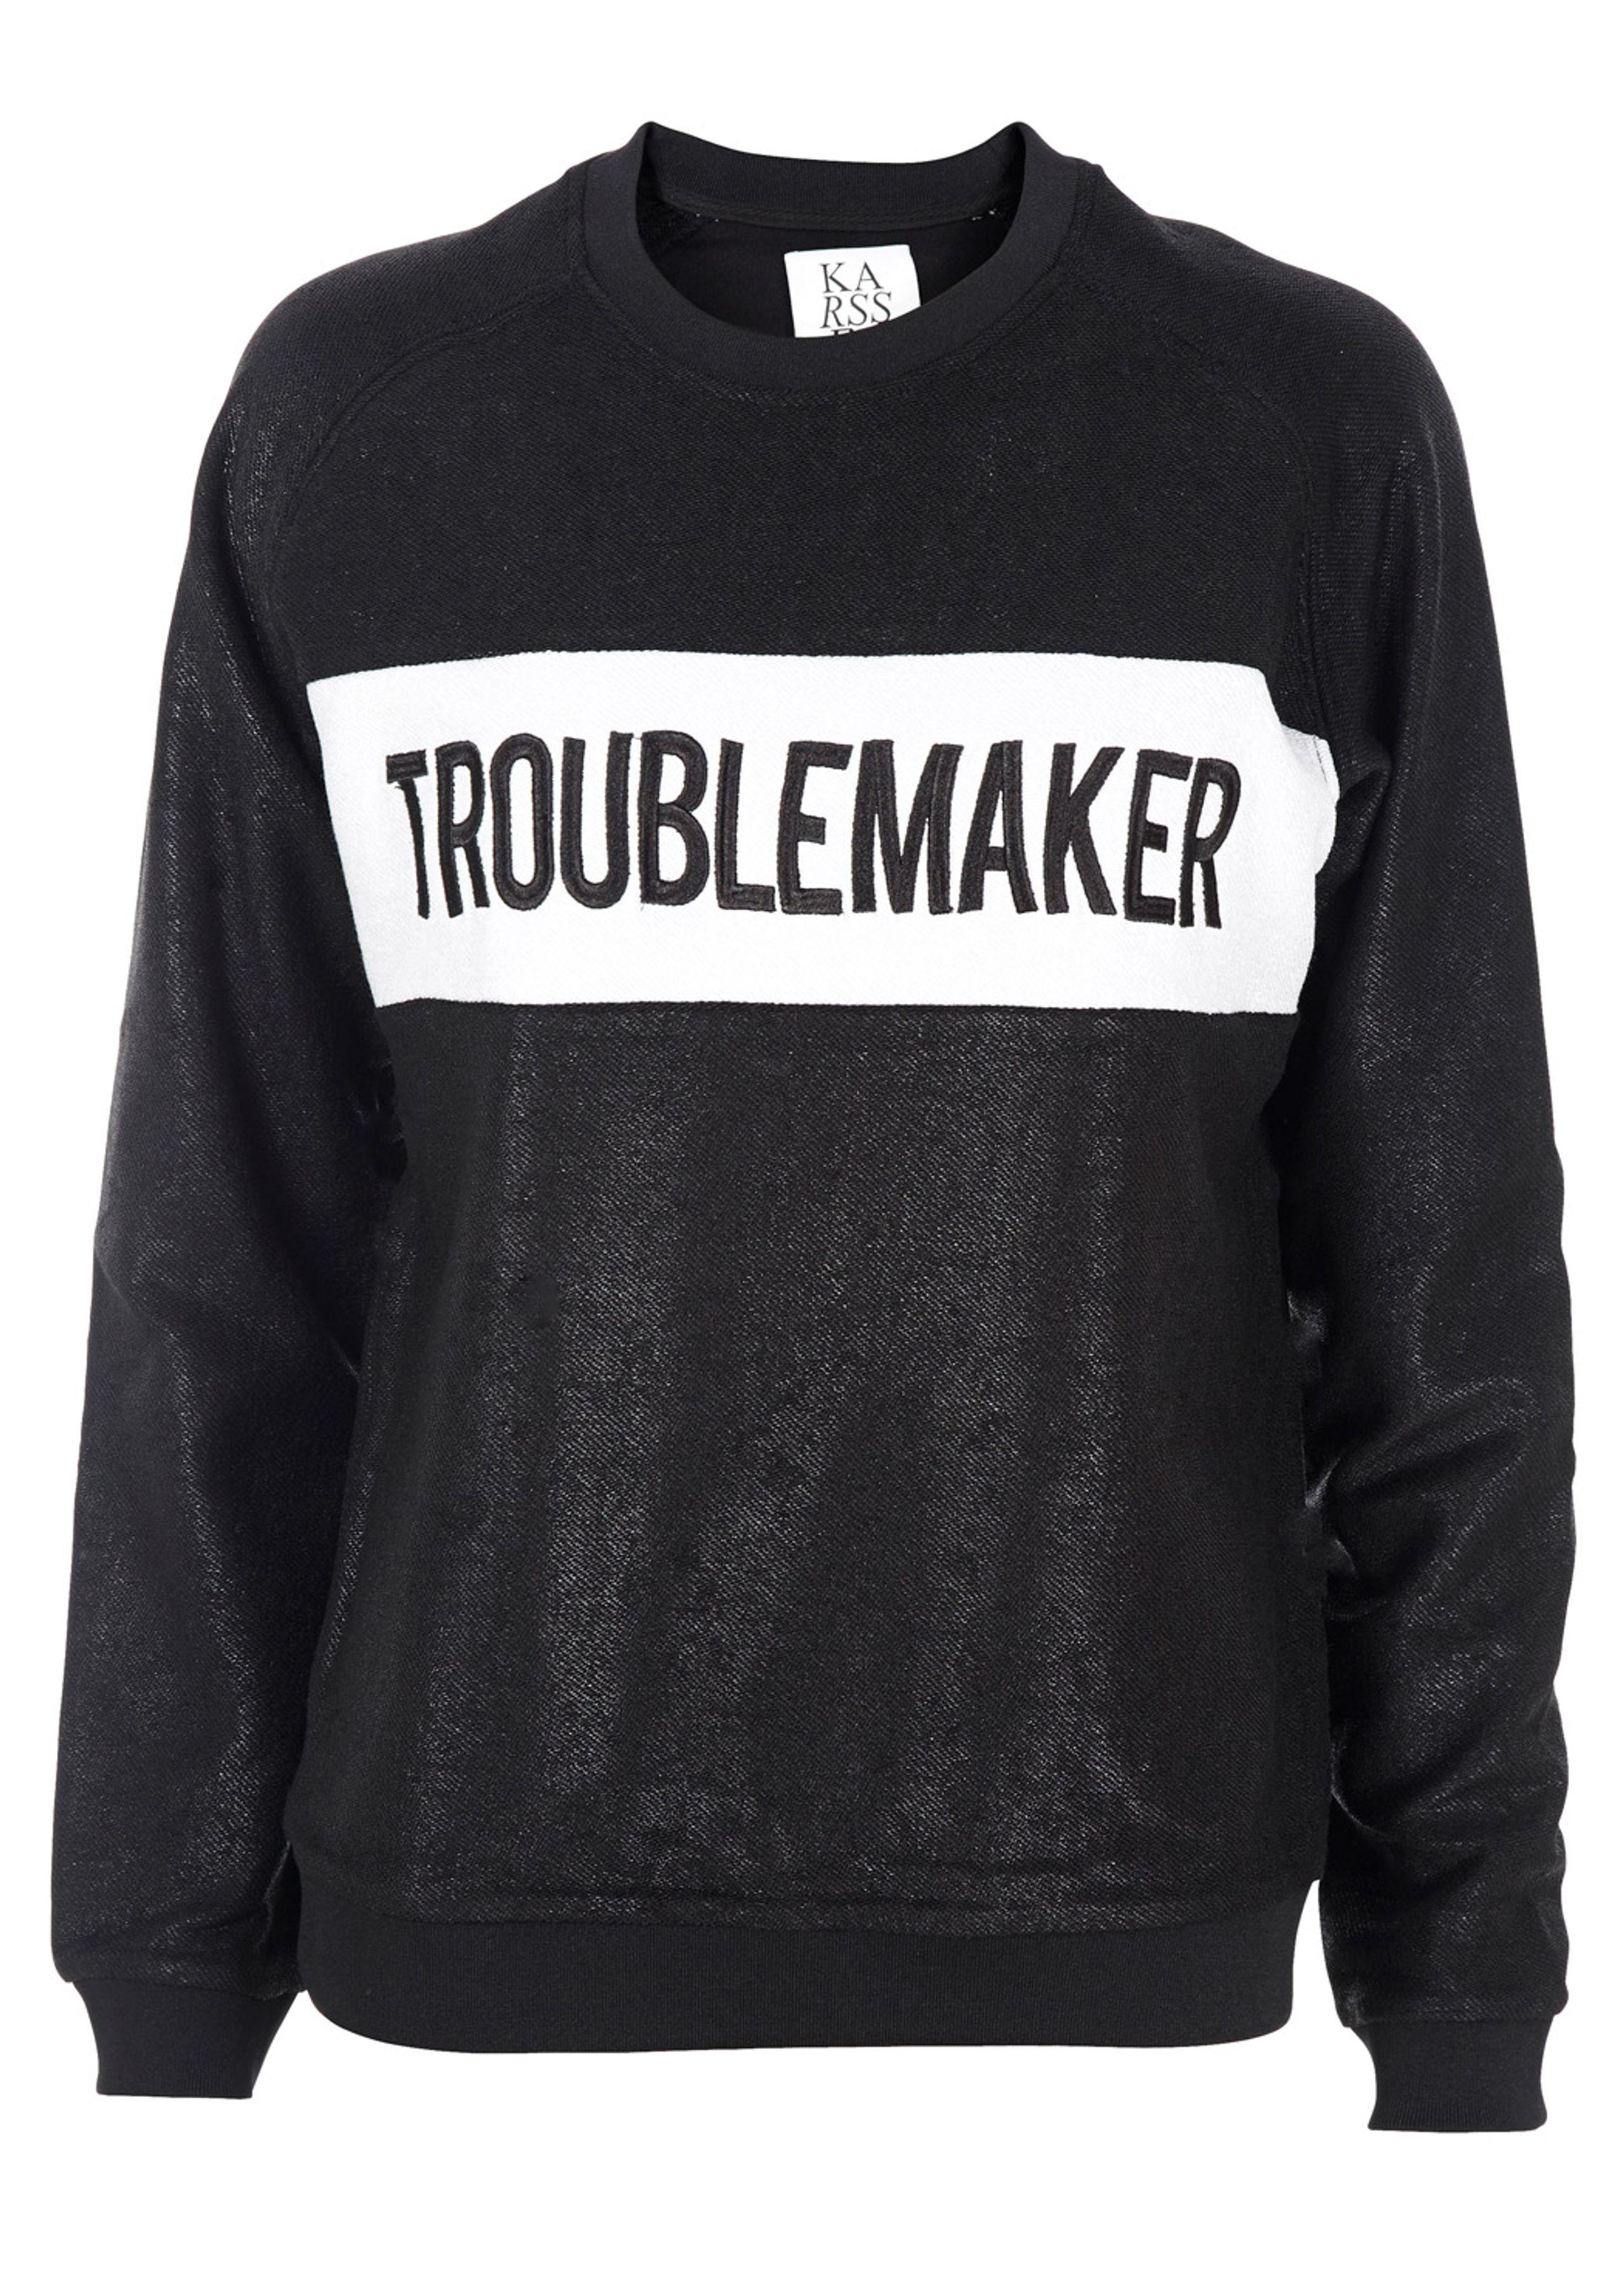 Loose fit raglan troublemaker